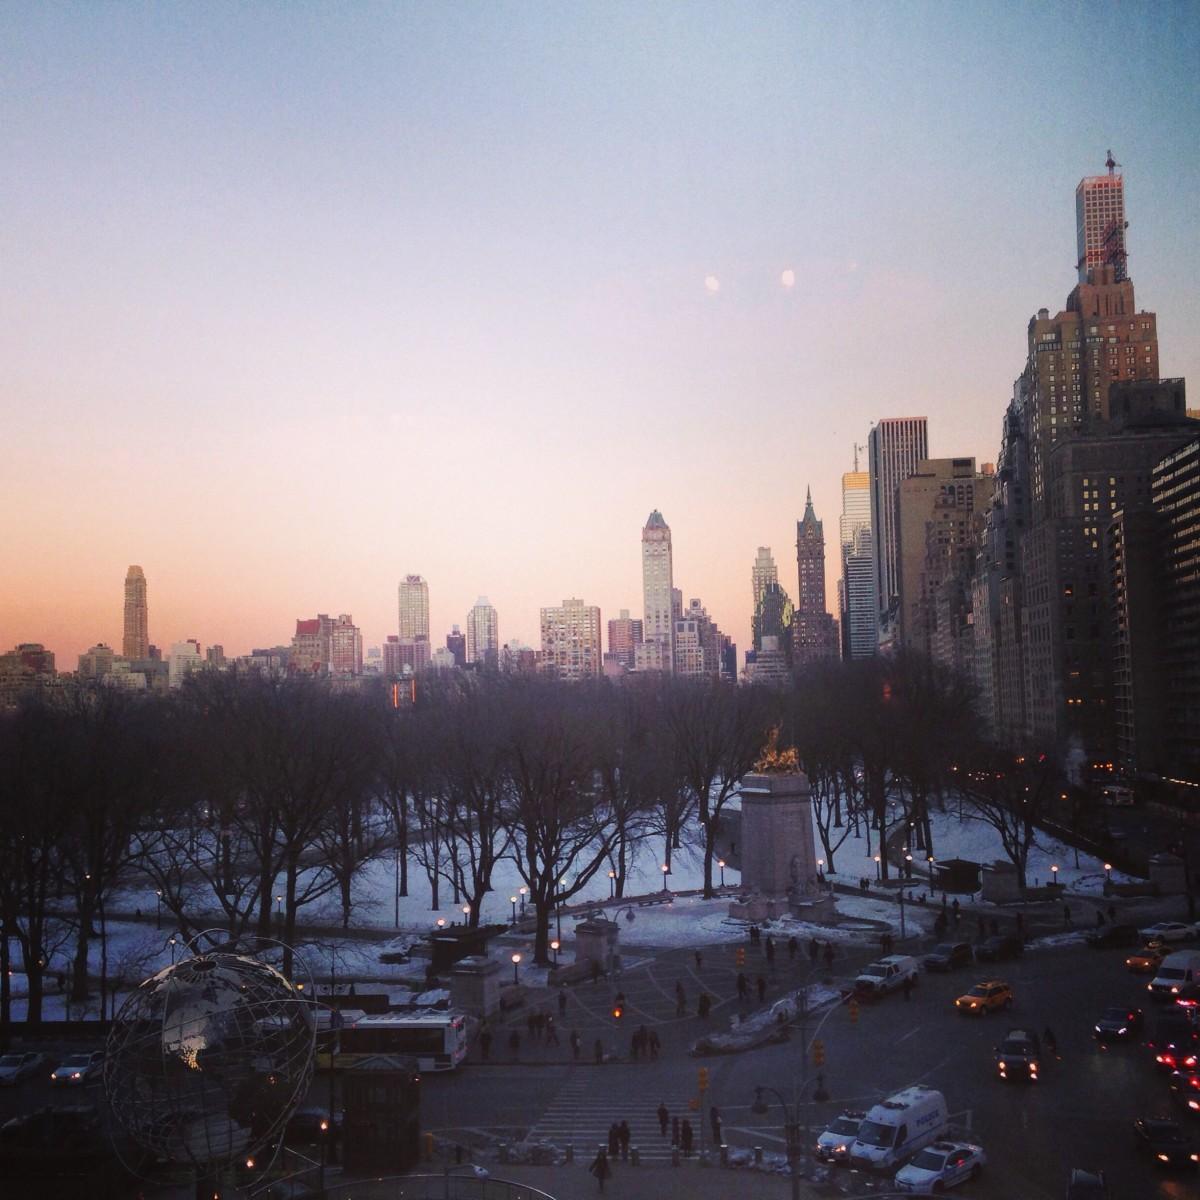 Sunset on Columbus Circle in NYC